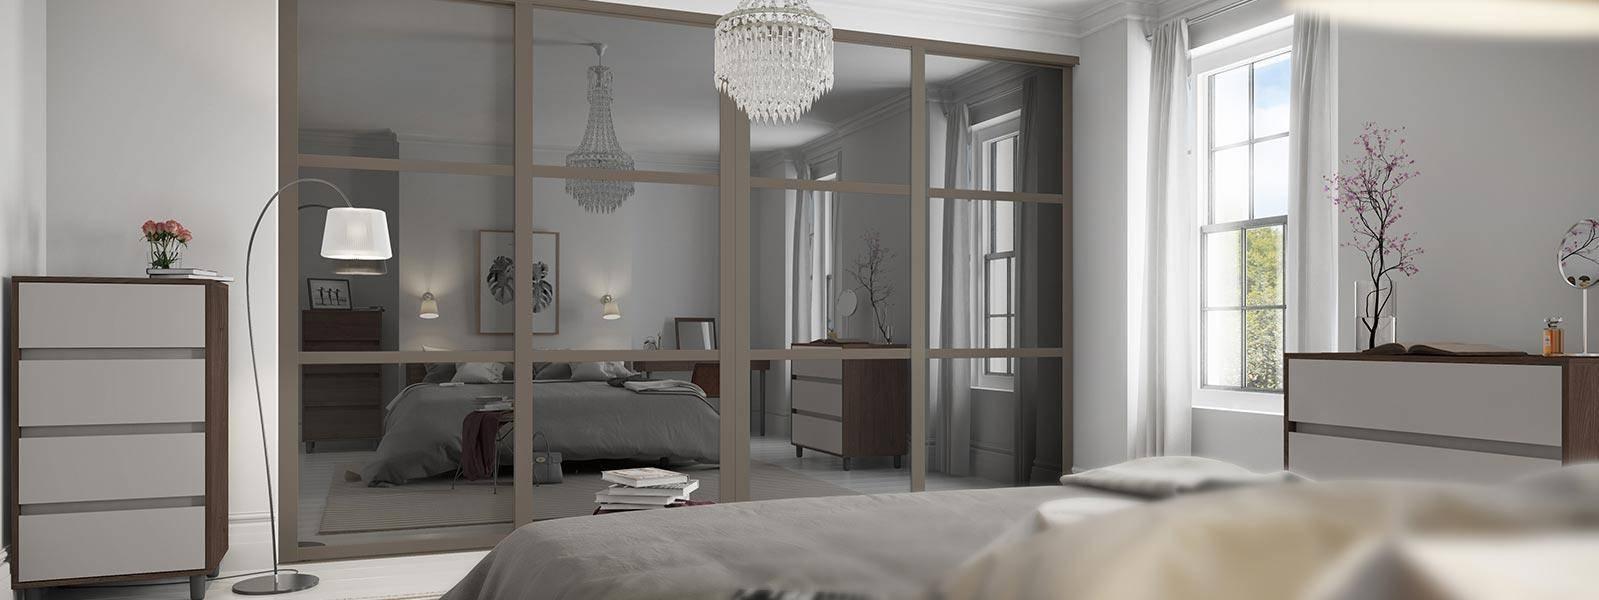 Sliding Wardrobe Doors, Mirrored Wardrobe Doors | Spaceslide regarding Mirrored Wardrobes (Image 14 of 15)